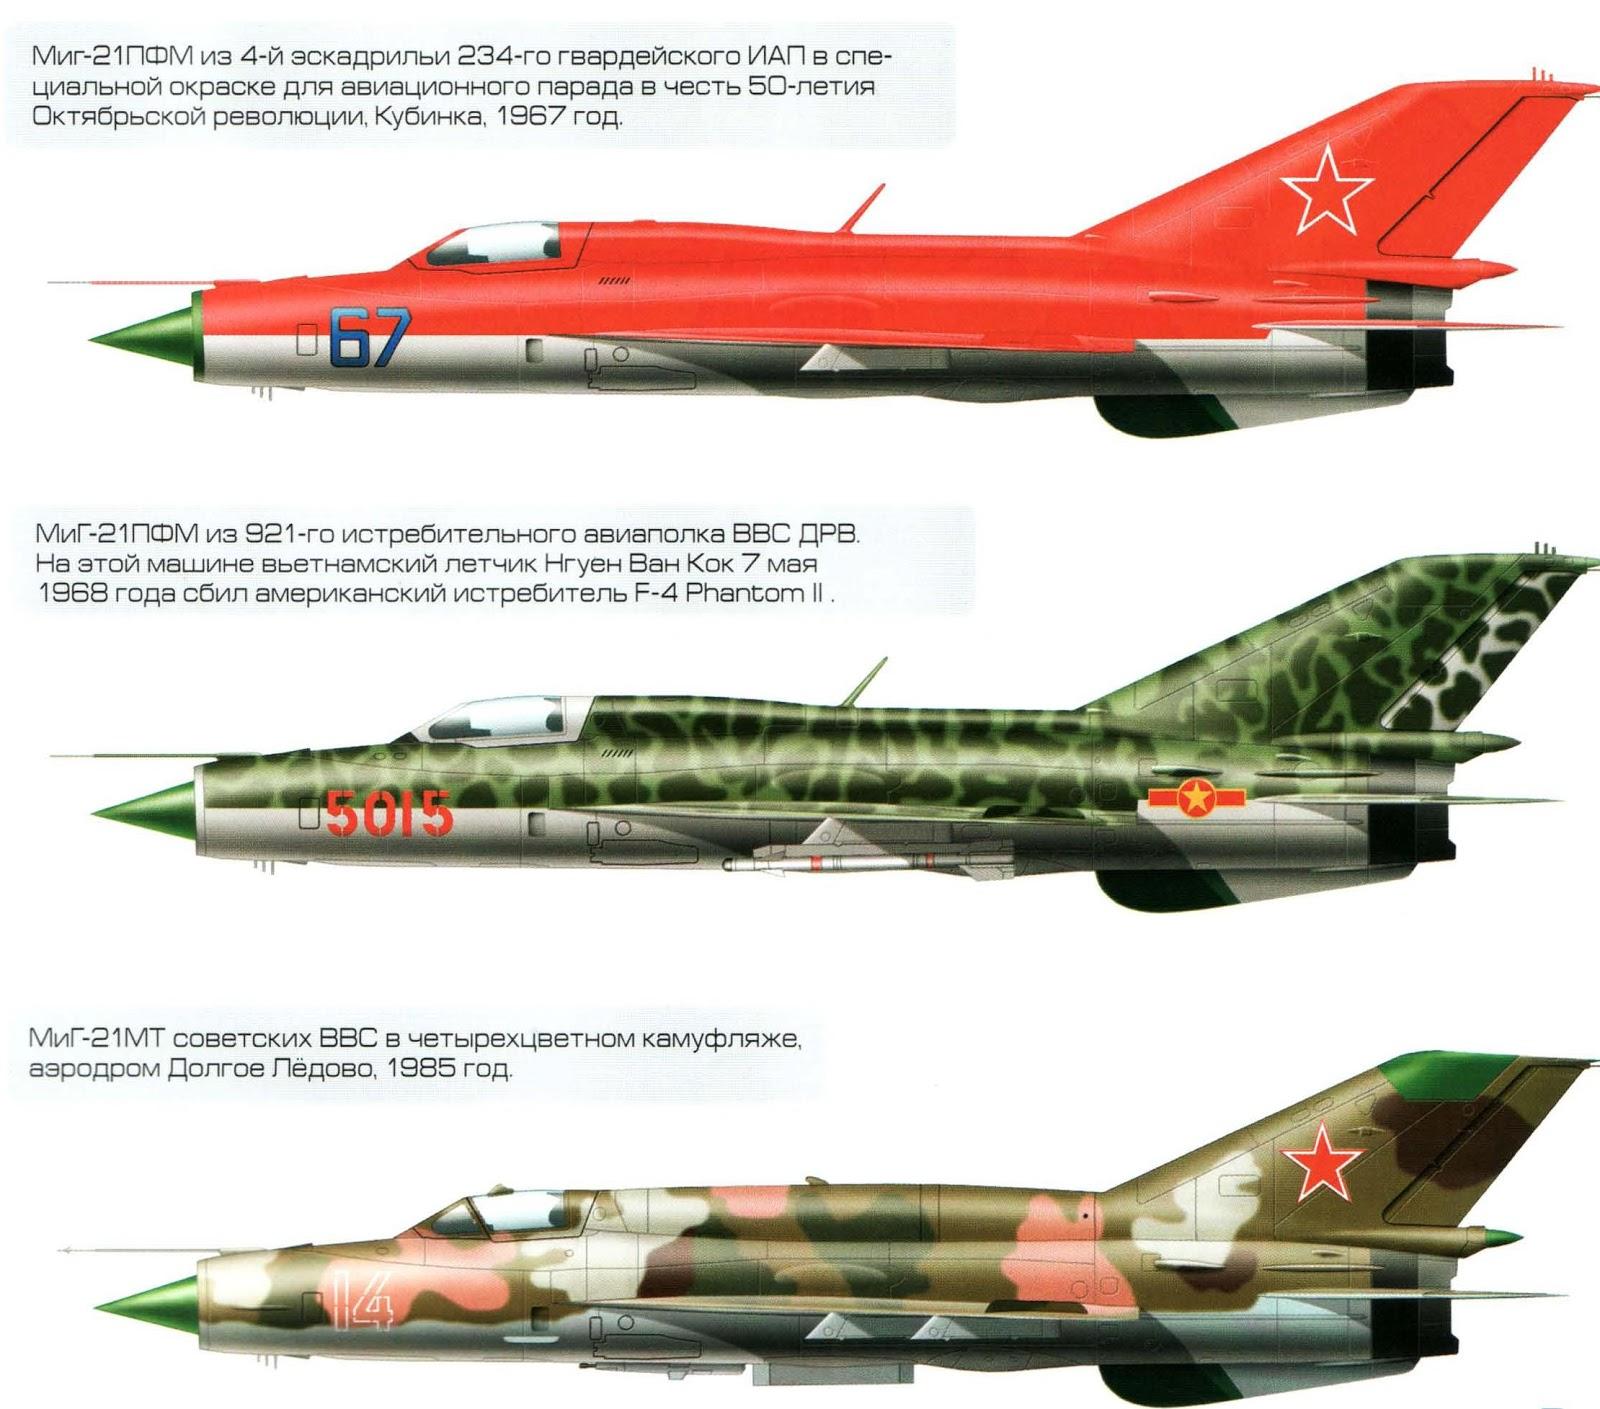 Миг-21 схема самолета